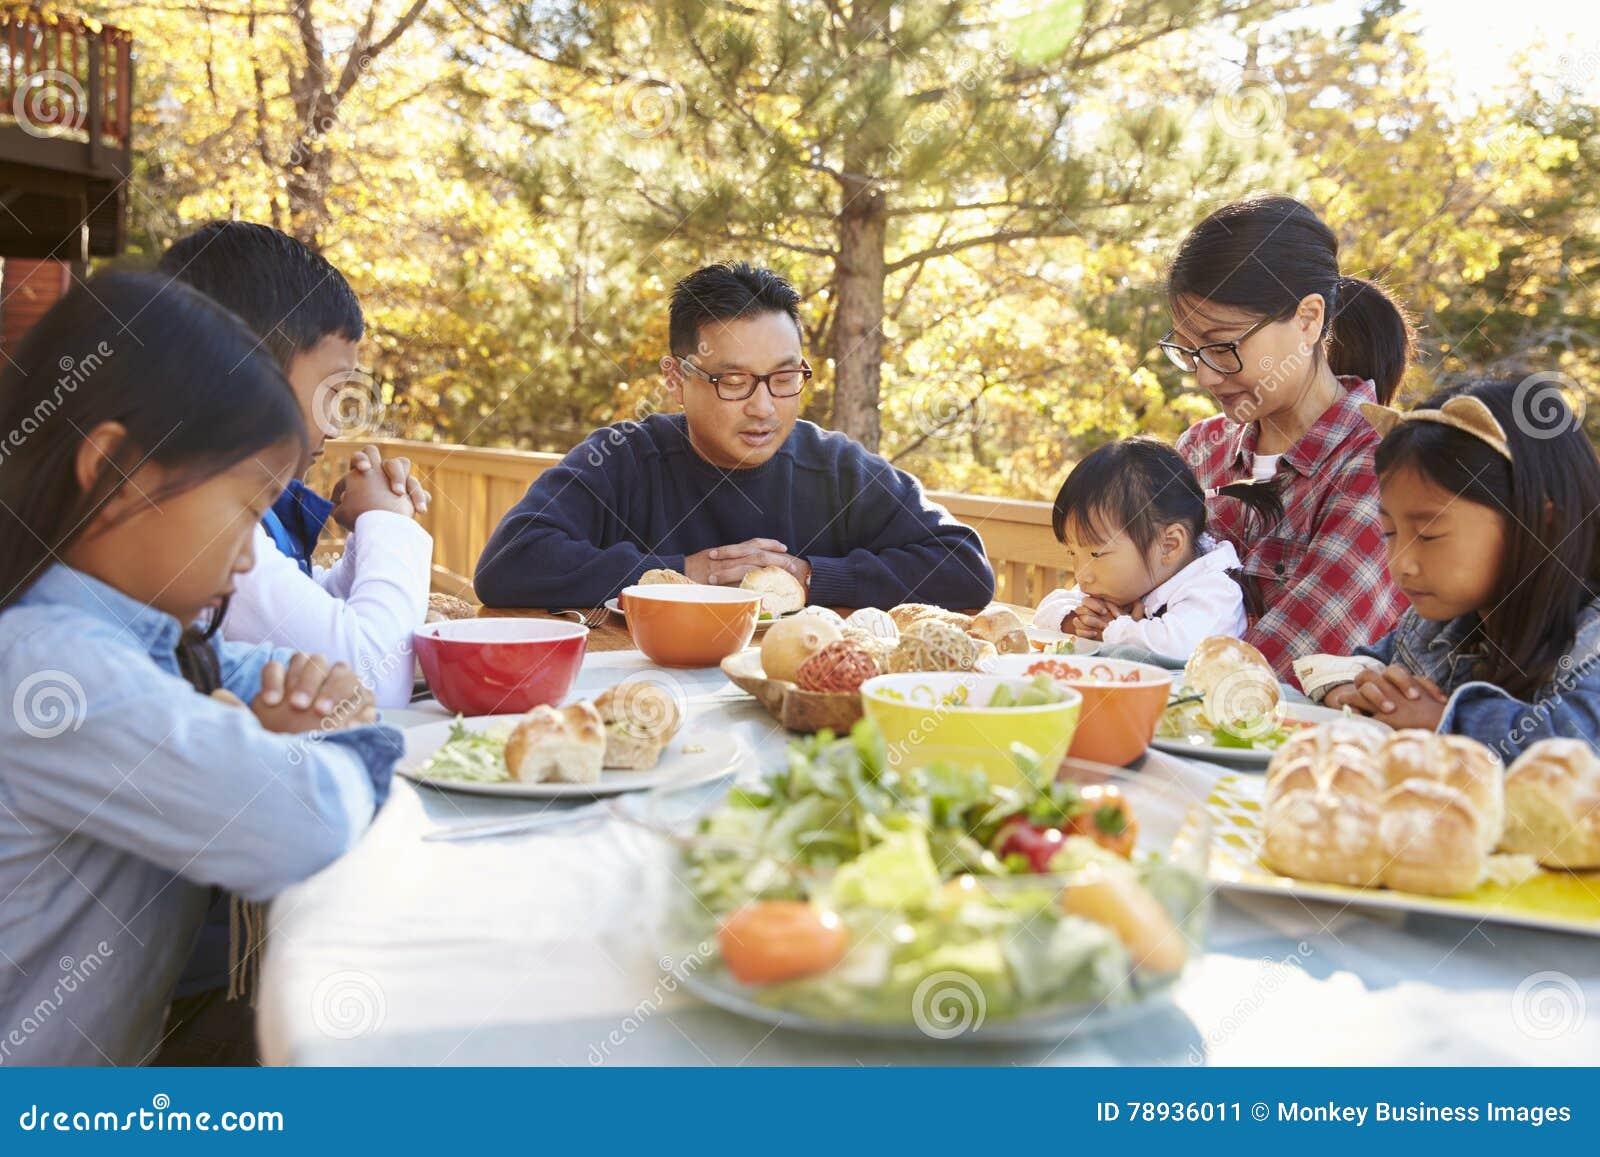 Asian prayer eating images